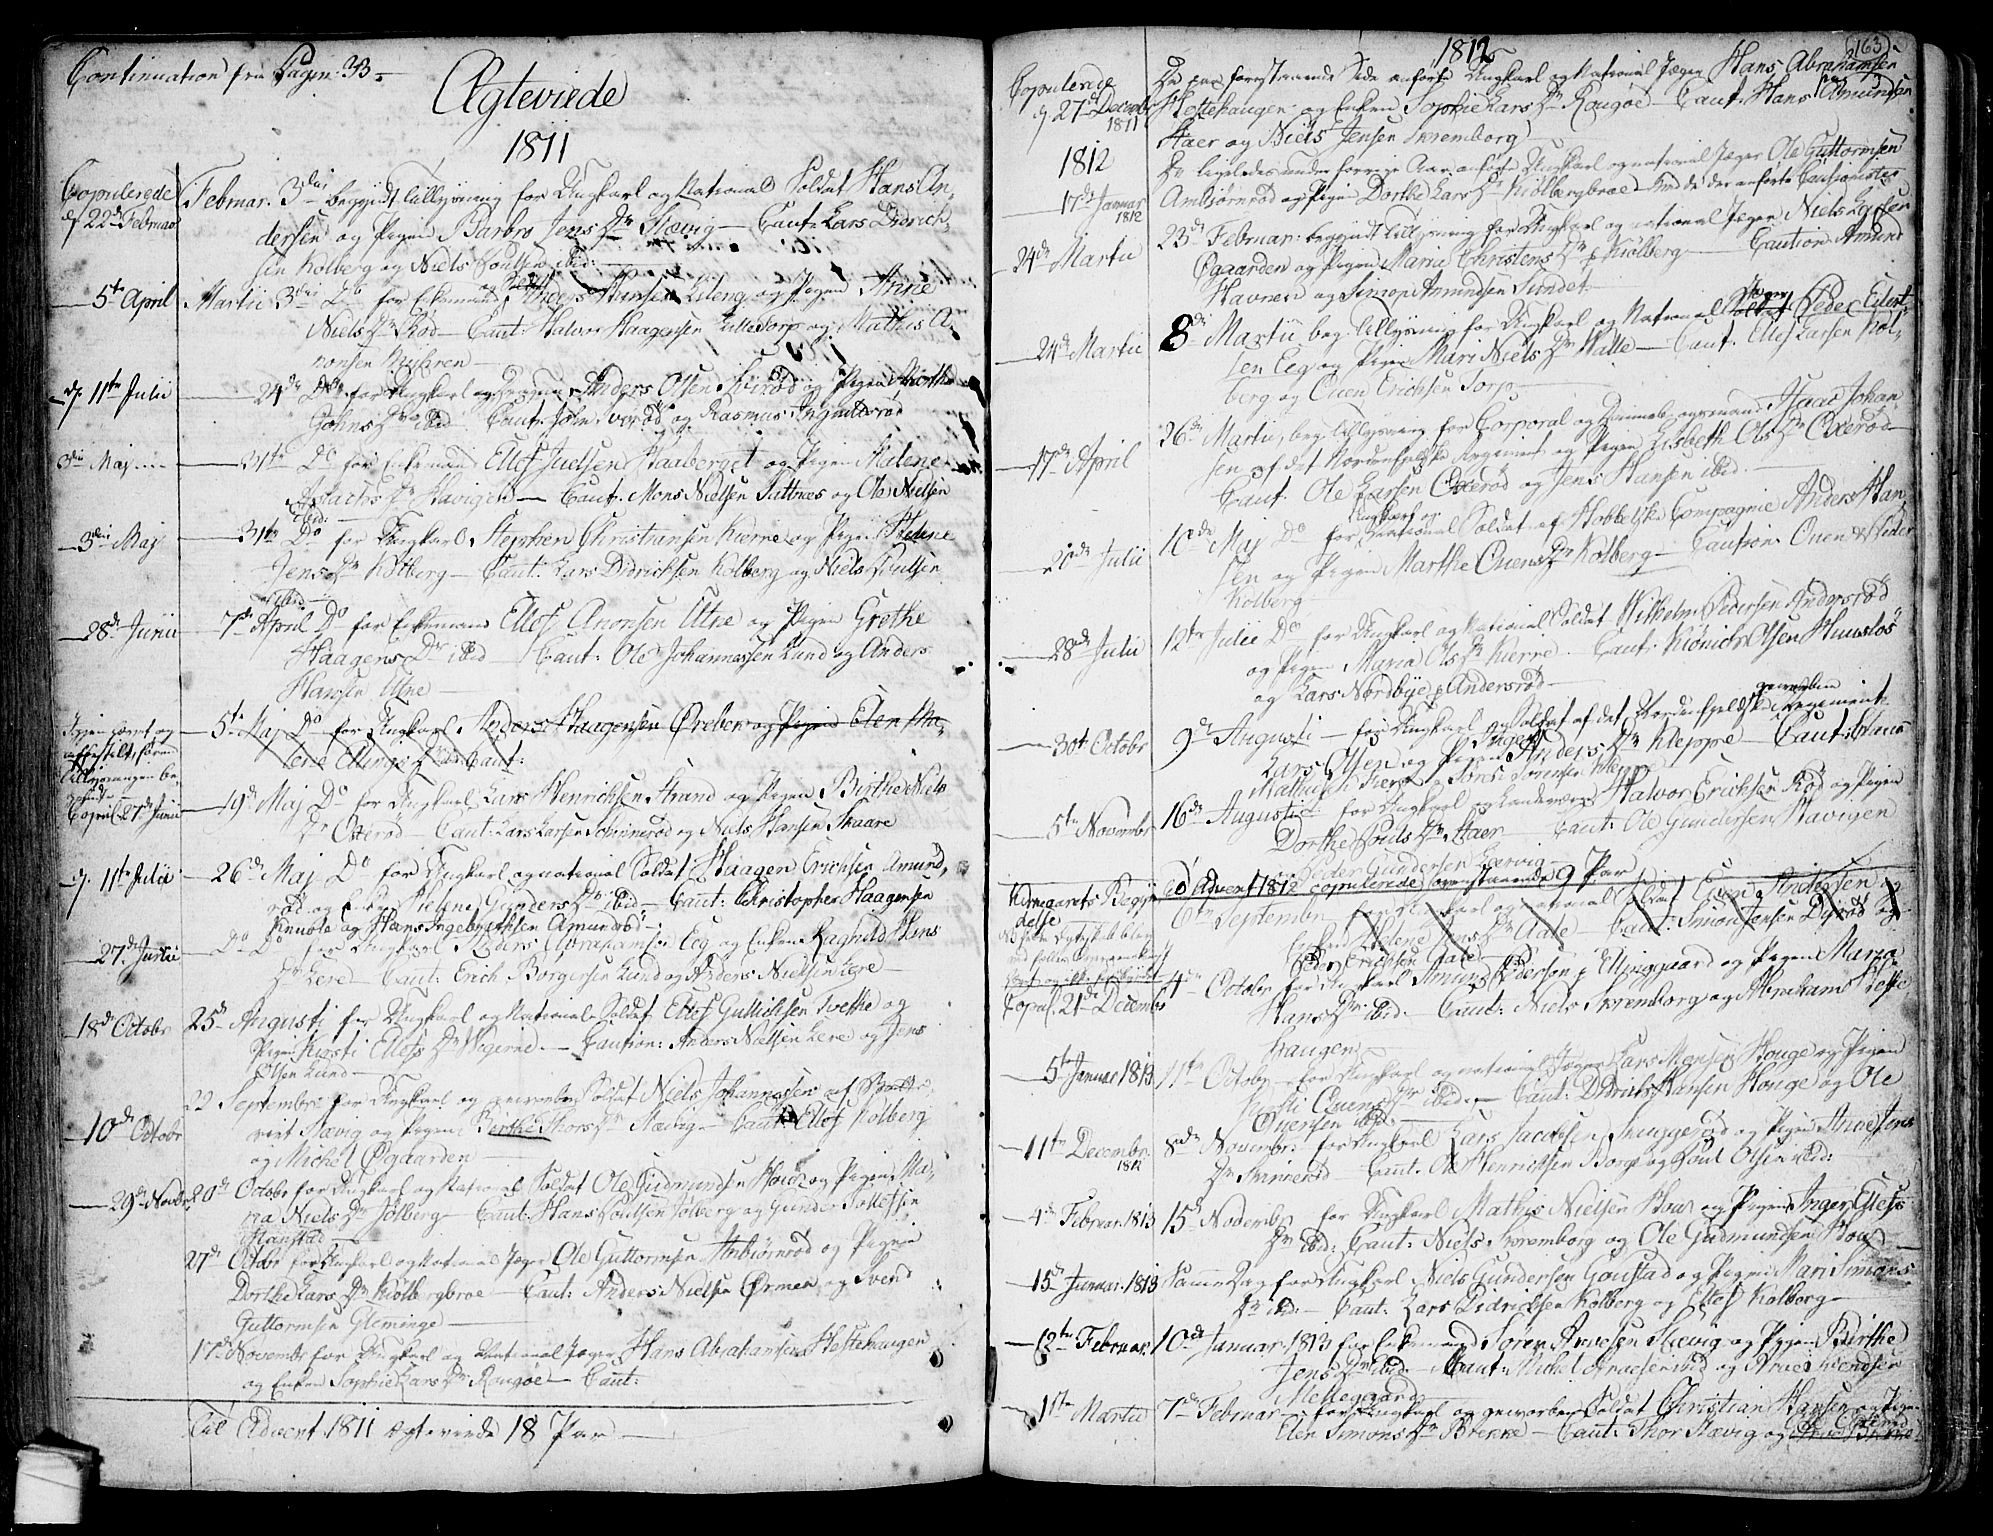 SAO, Onsøy prestekontor Kirkebøker, F/Fa/L0001: Parish register (official) no. I 1, 1733-1814, p. 163